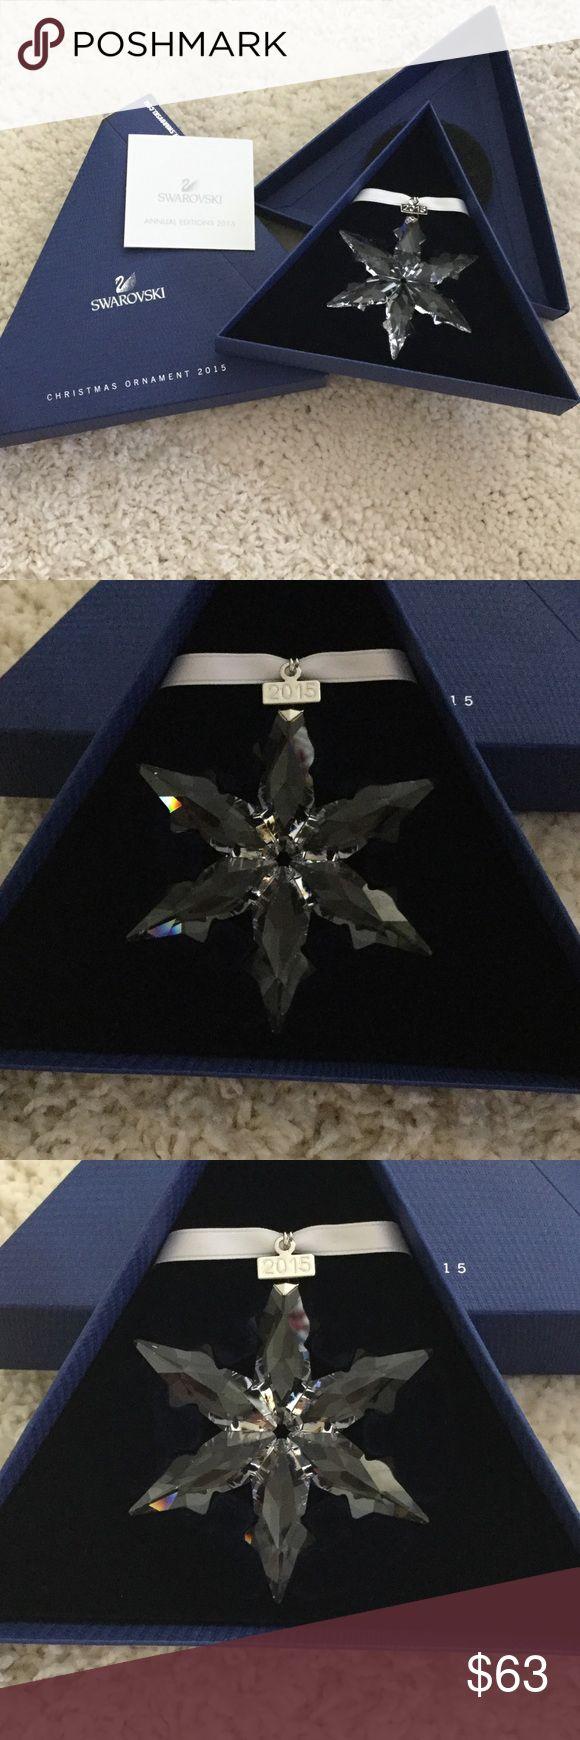 New💎swarovski Xmas Ornament 2015 2015 Snowflake Originally $7900! This Is  Brand New,